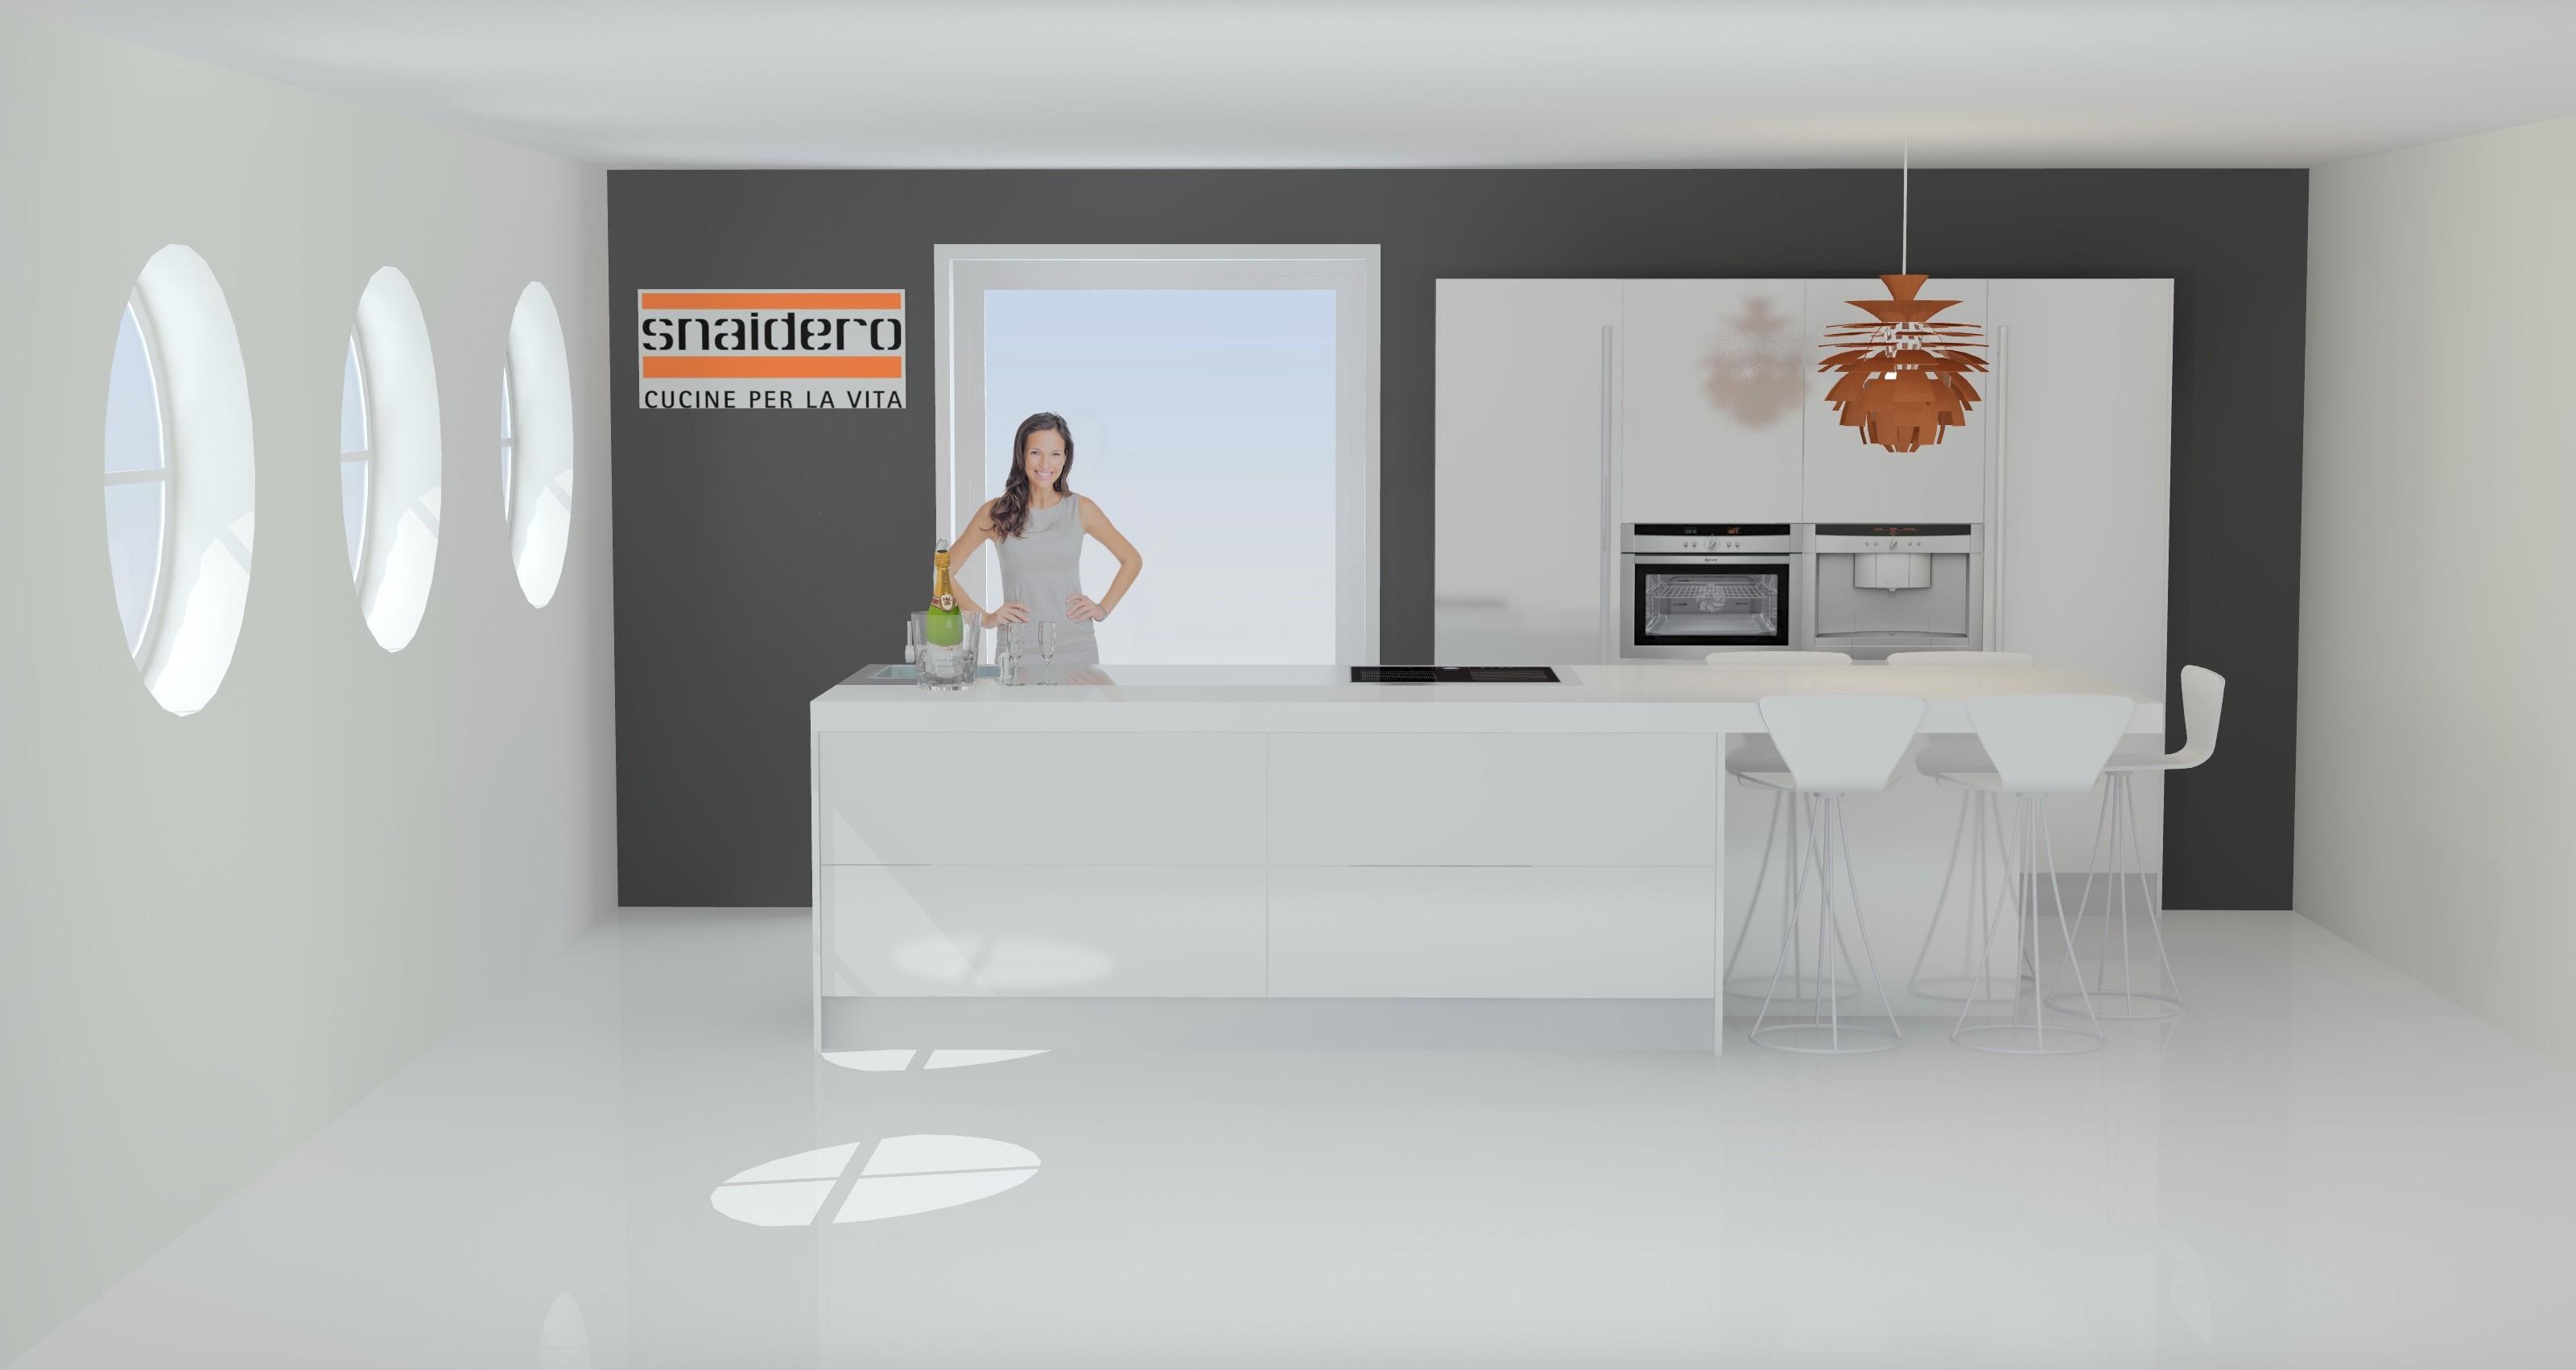 Snaidero concept store   stijlvolle designkeukens, italiaans ...